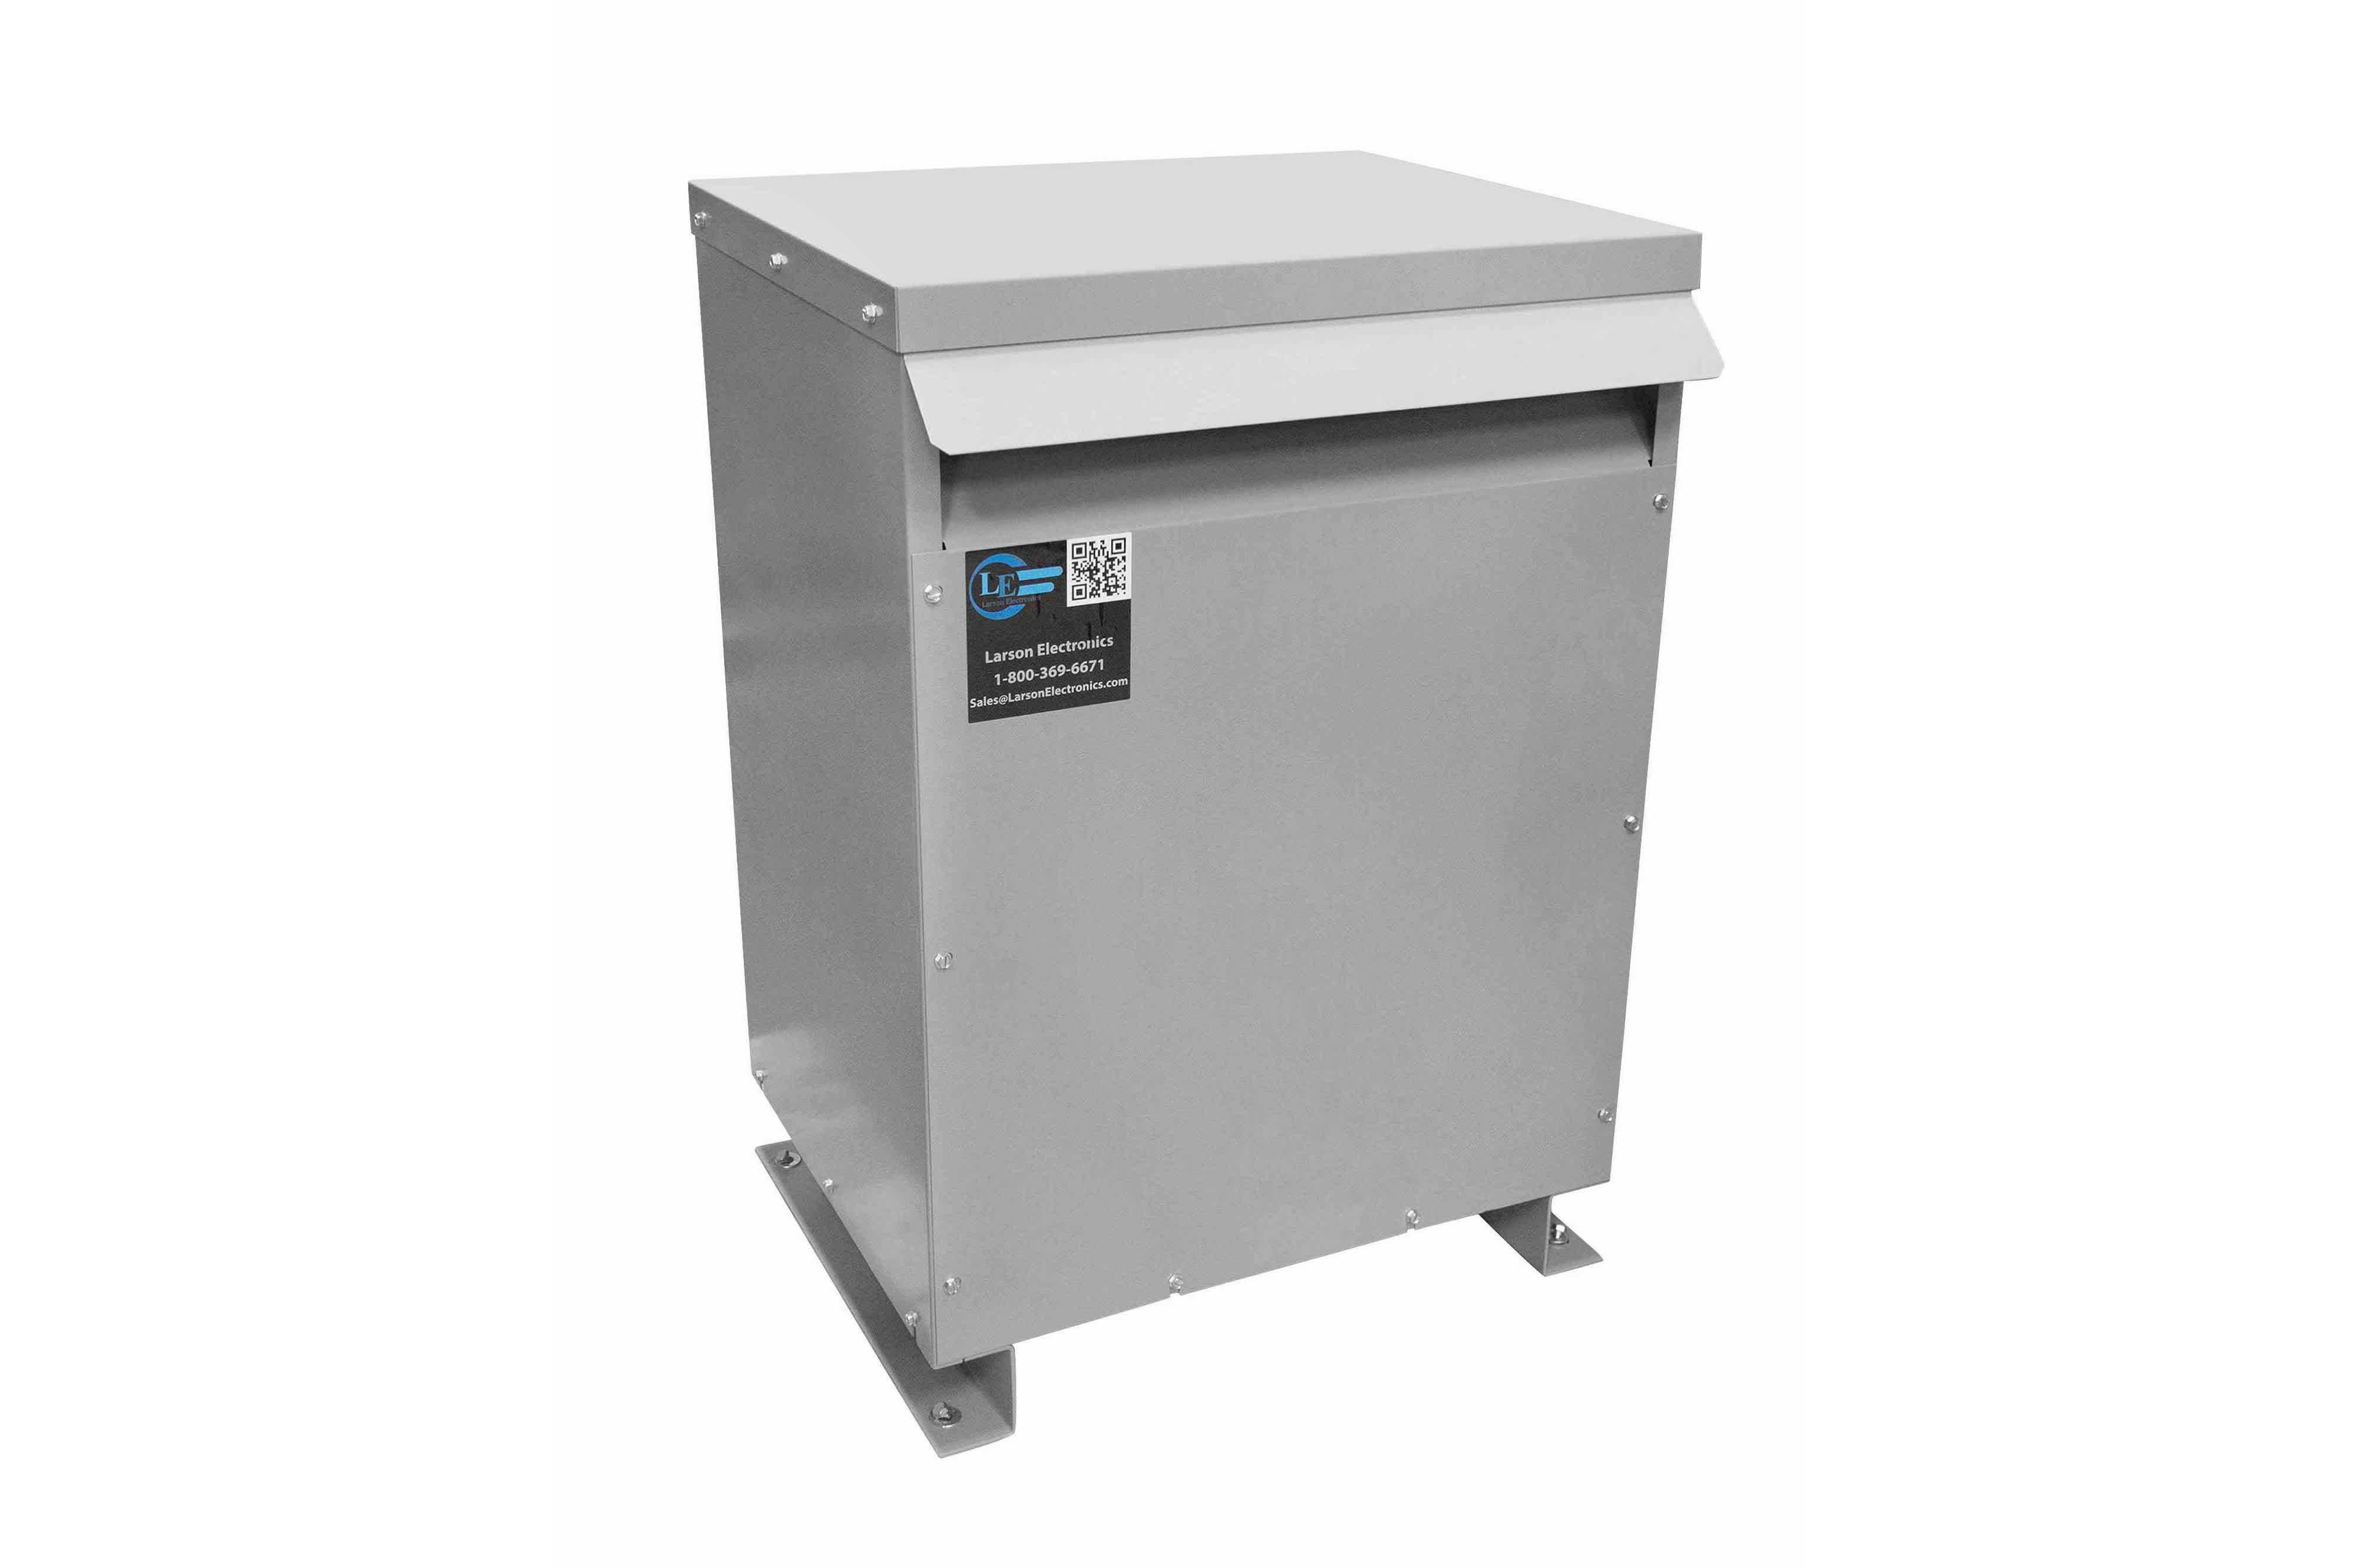 28 kVA 3PH DOE Transformer, 240V Delta Primary, 415Y/240 Wye-N Secondary, N3R, Ventilated, 60 Hz